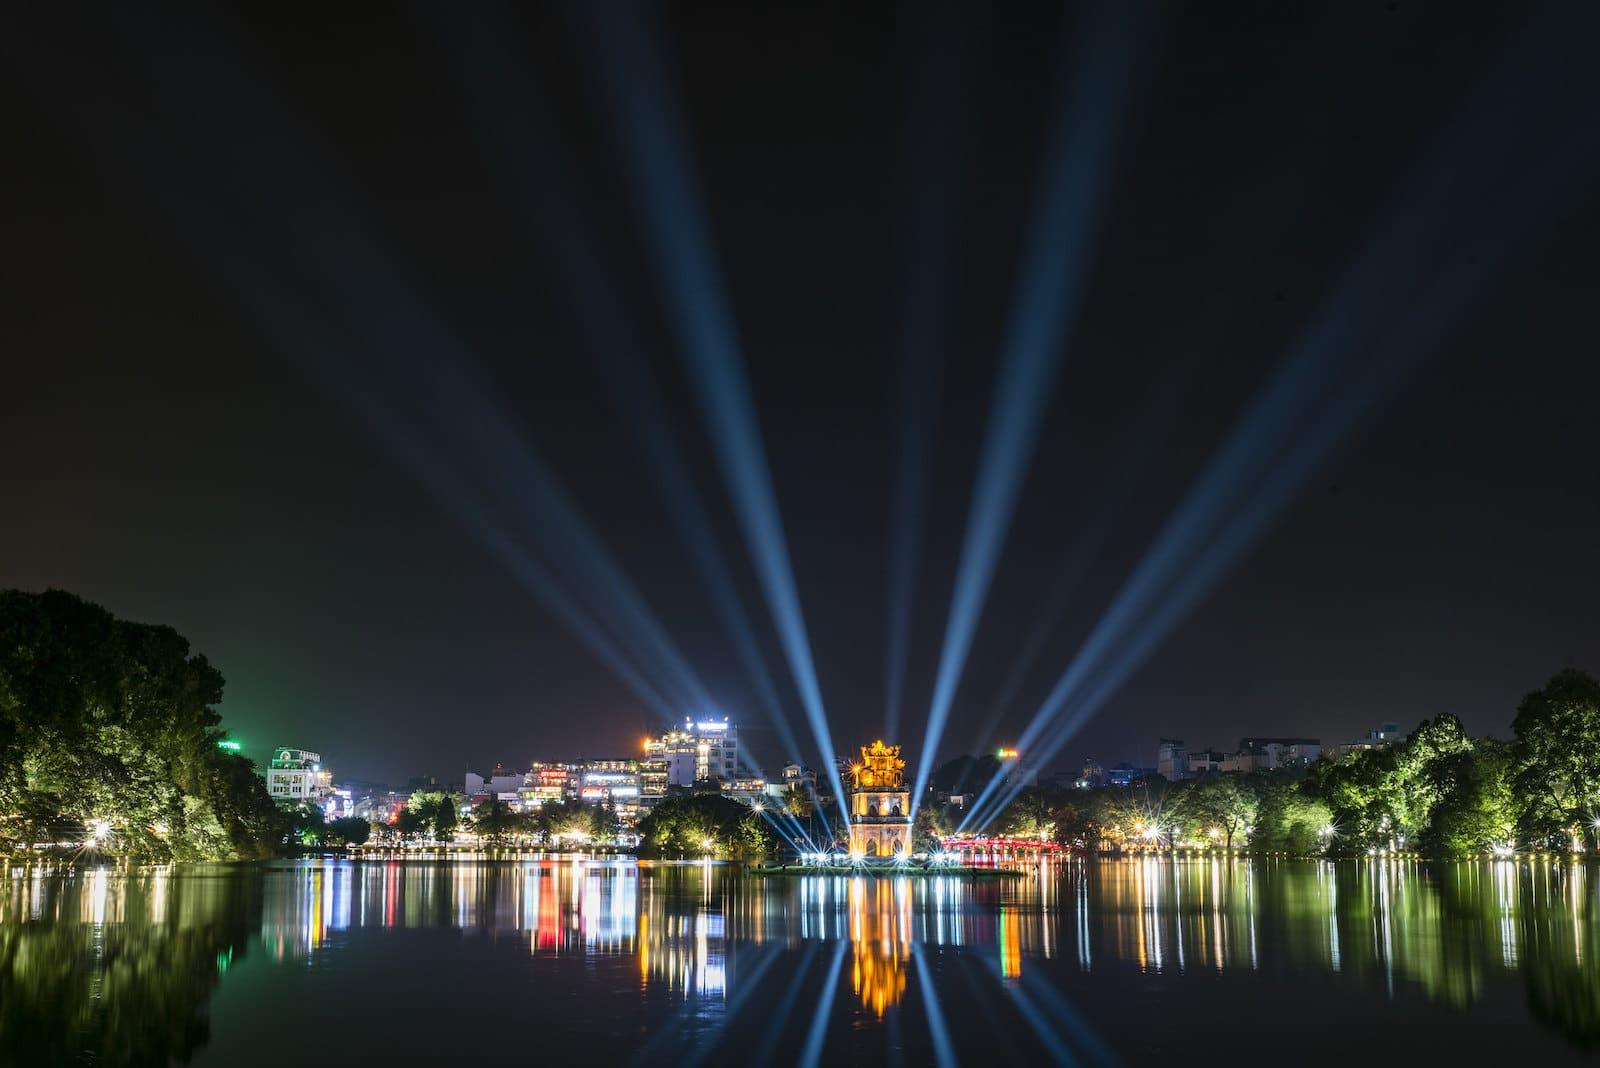 Image of Hoan Kiem Lake in Hanoi, Vietnam at night